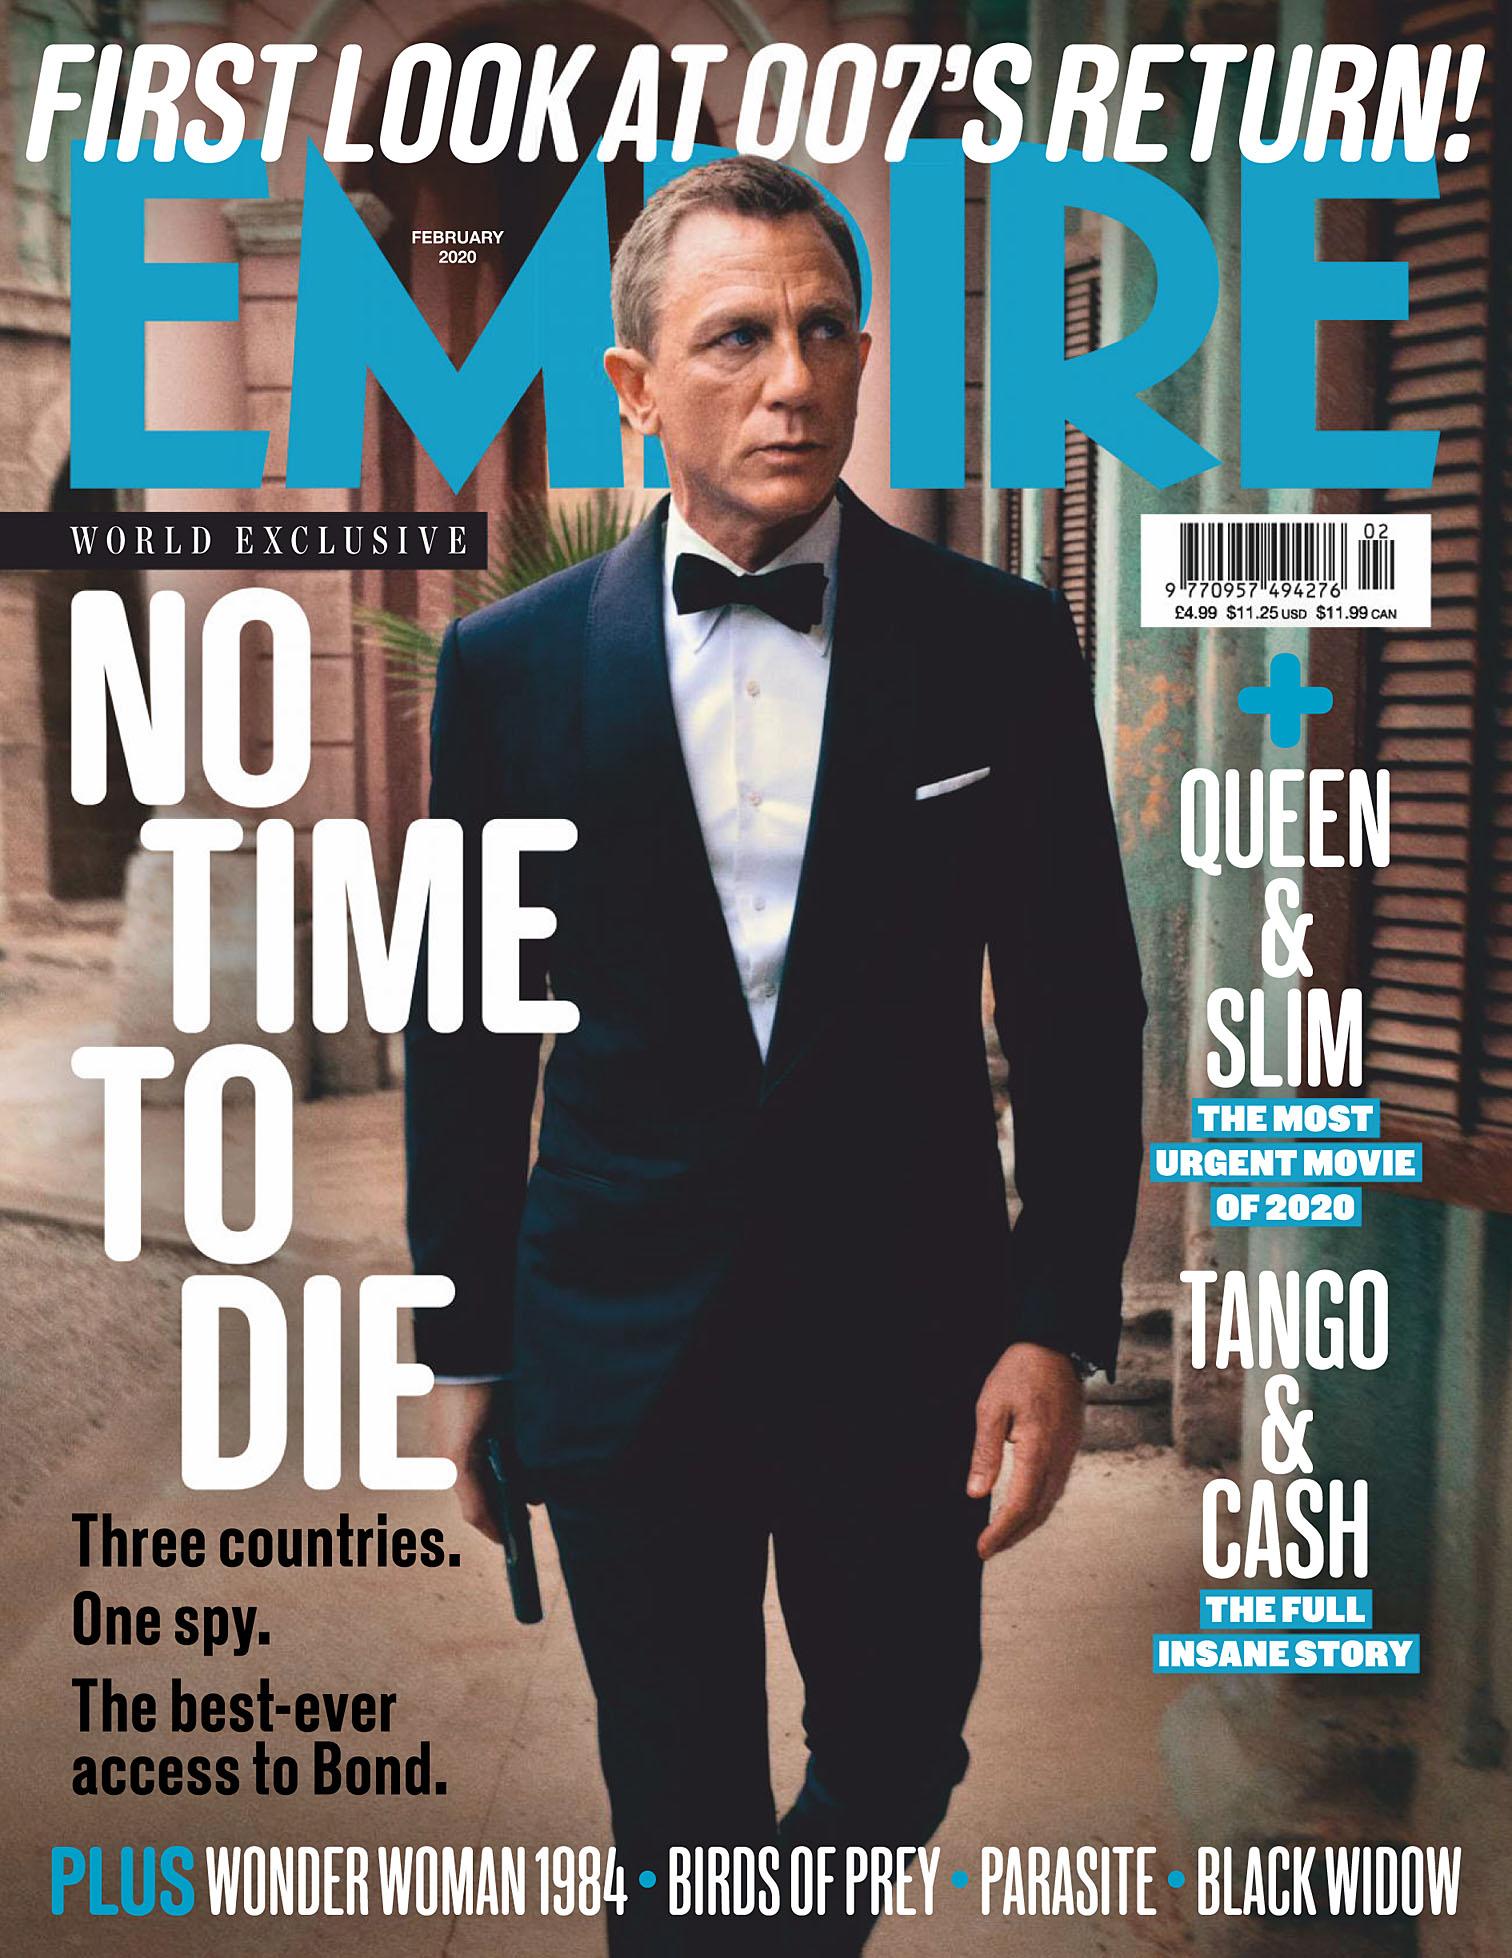 Empire UK 2020-02 Bond 01.jpg